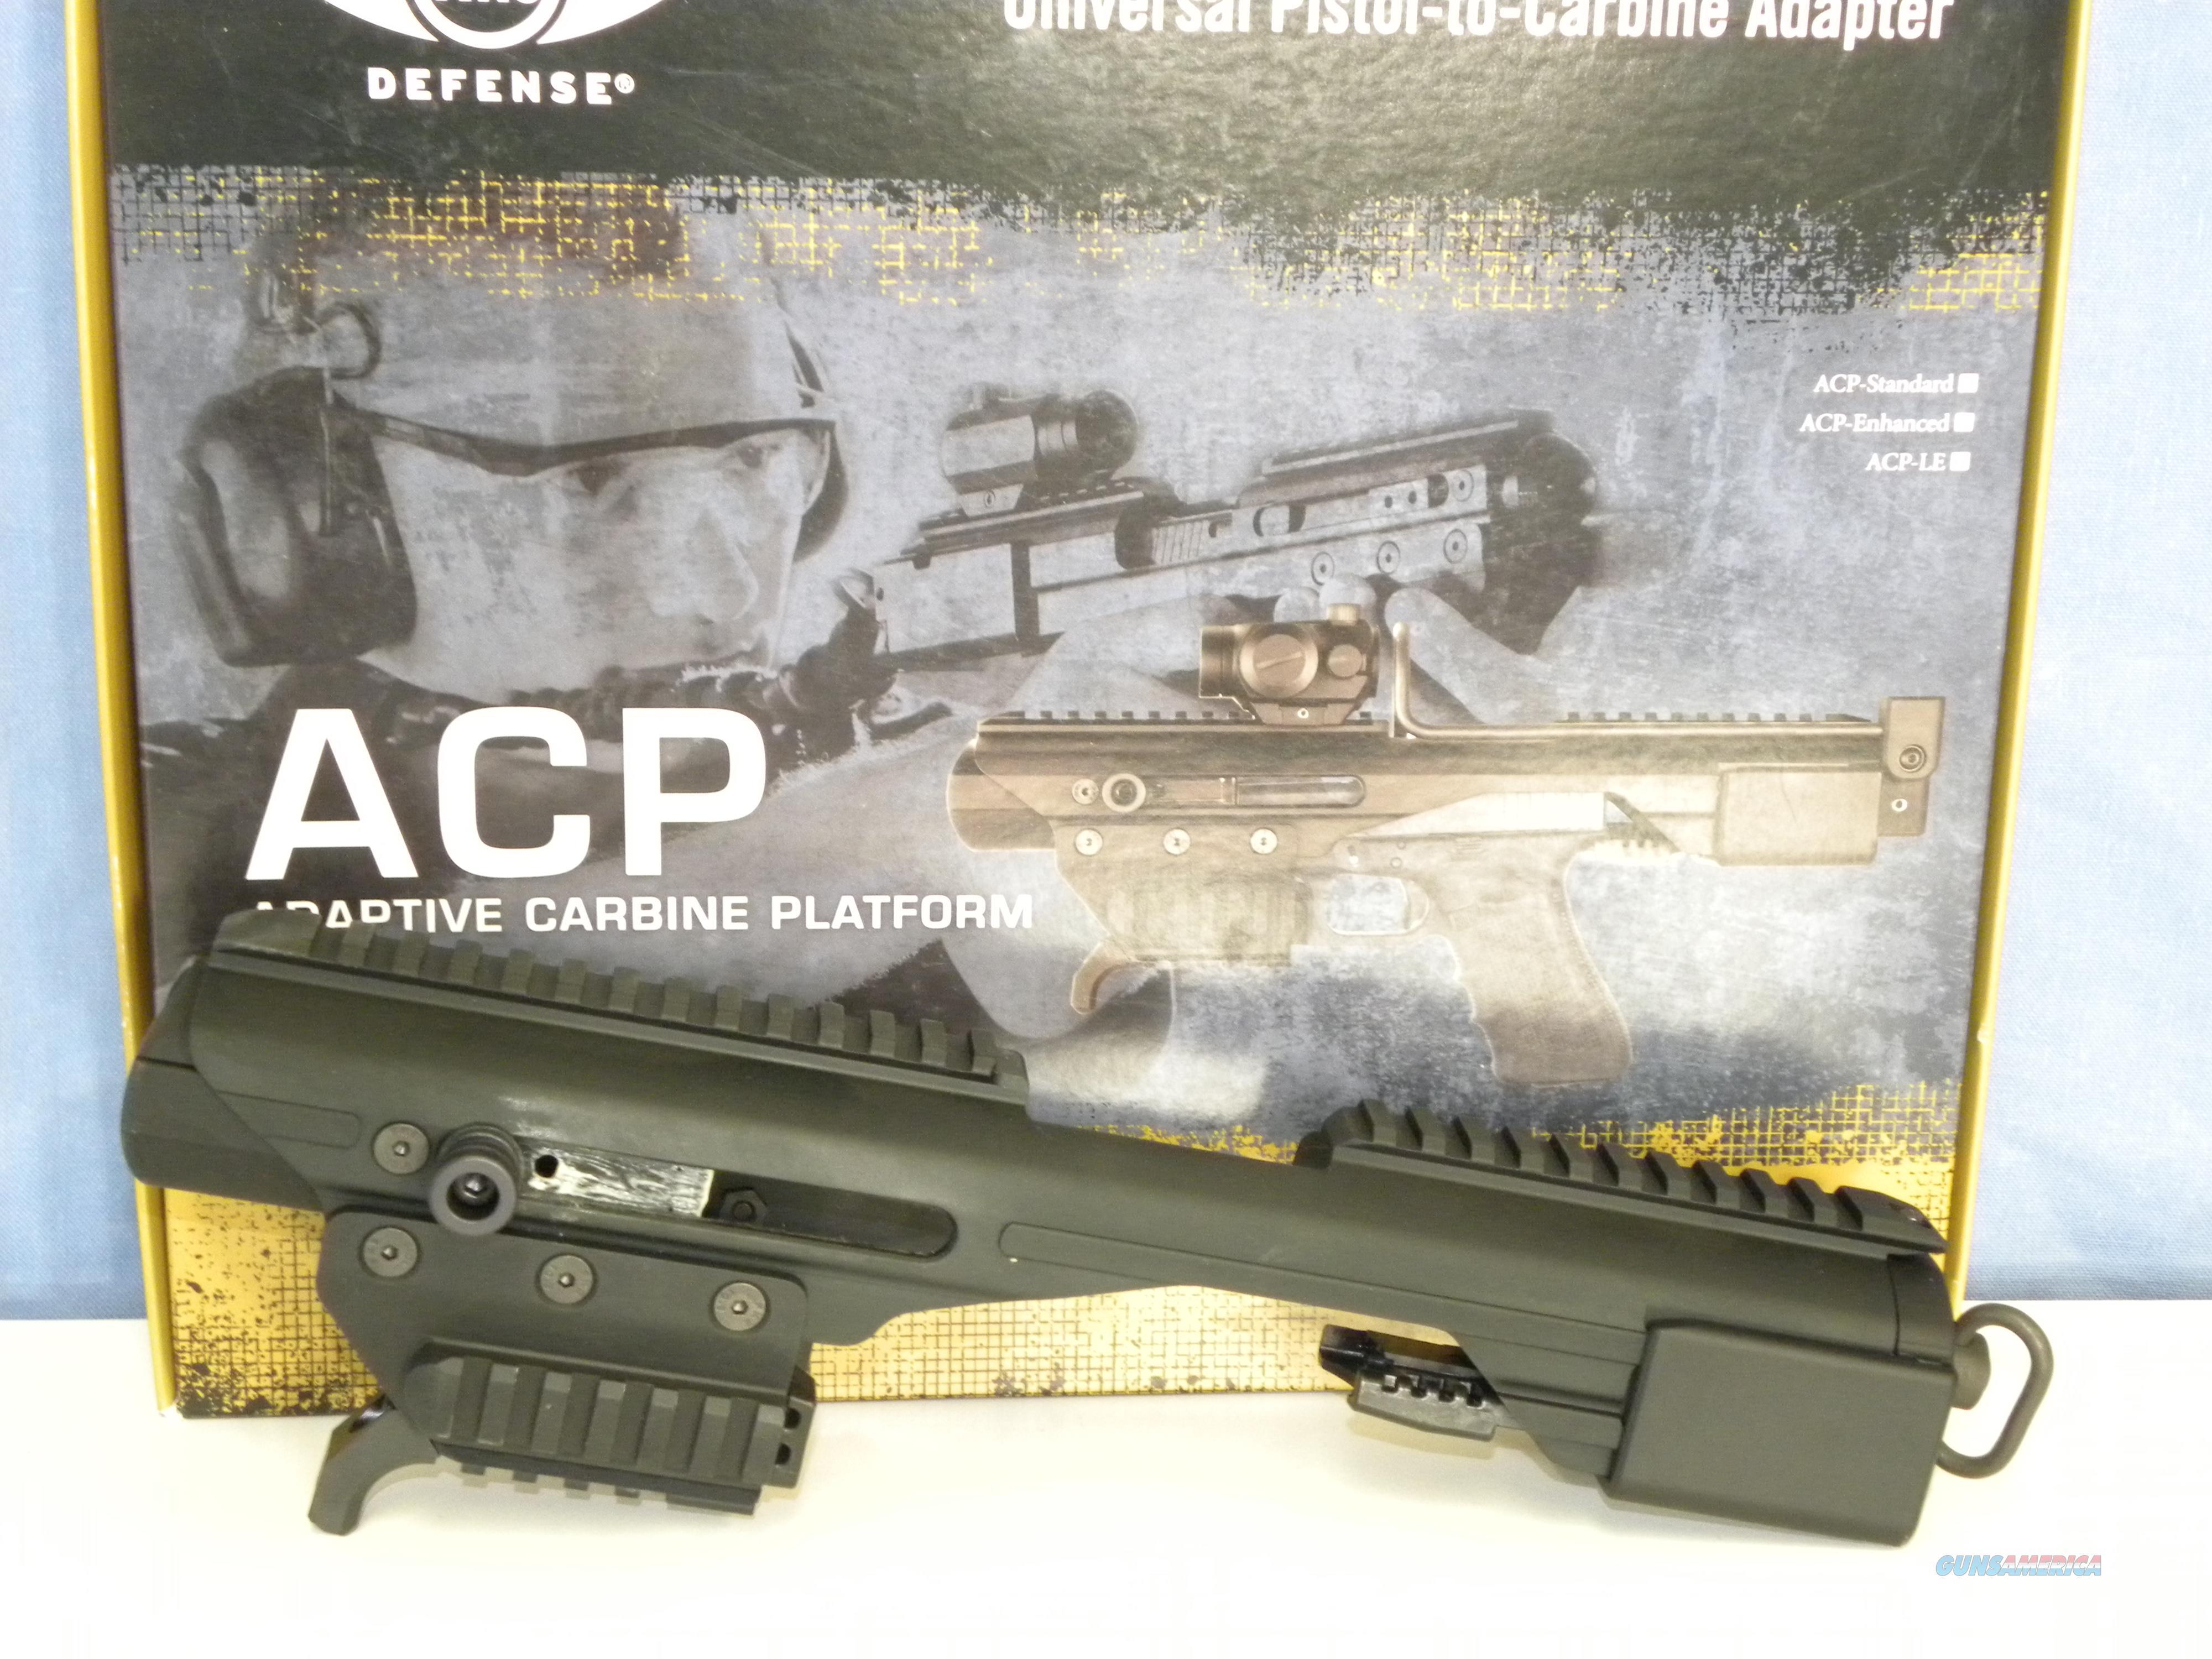 ITAC Adaptive Carbine Platform  Non-Guns > Gunstocks, Grips & Wood